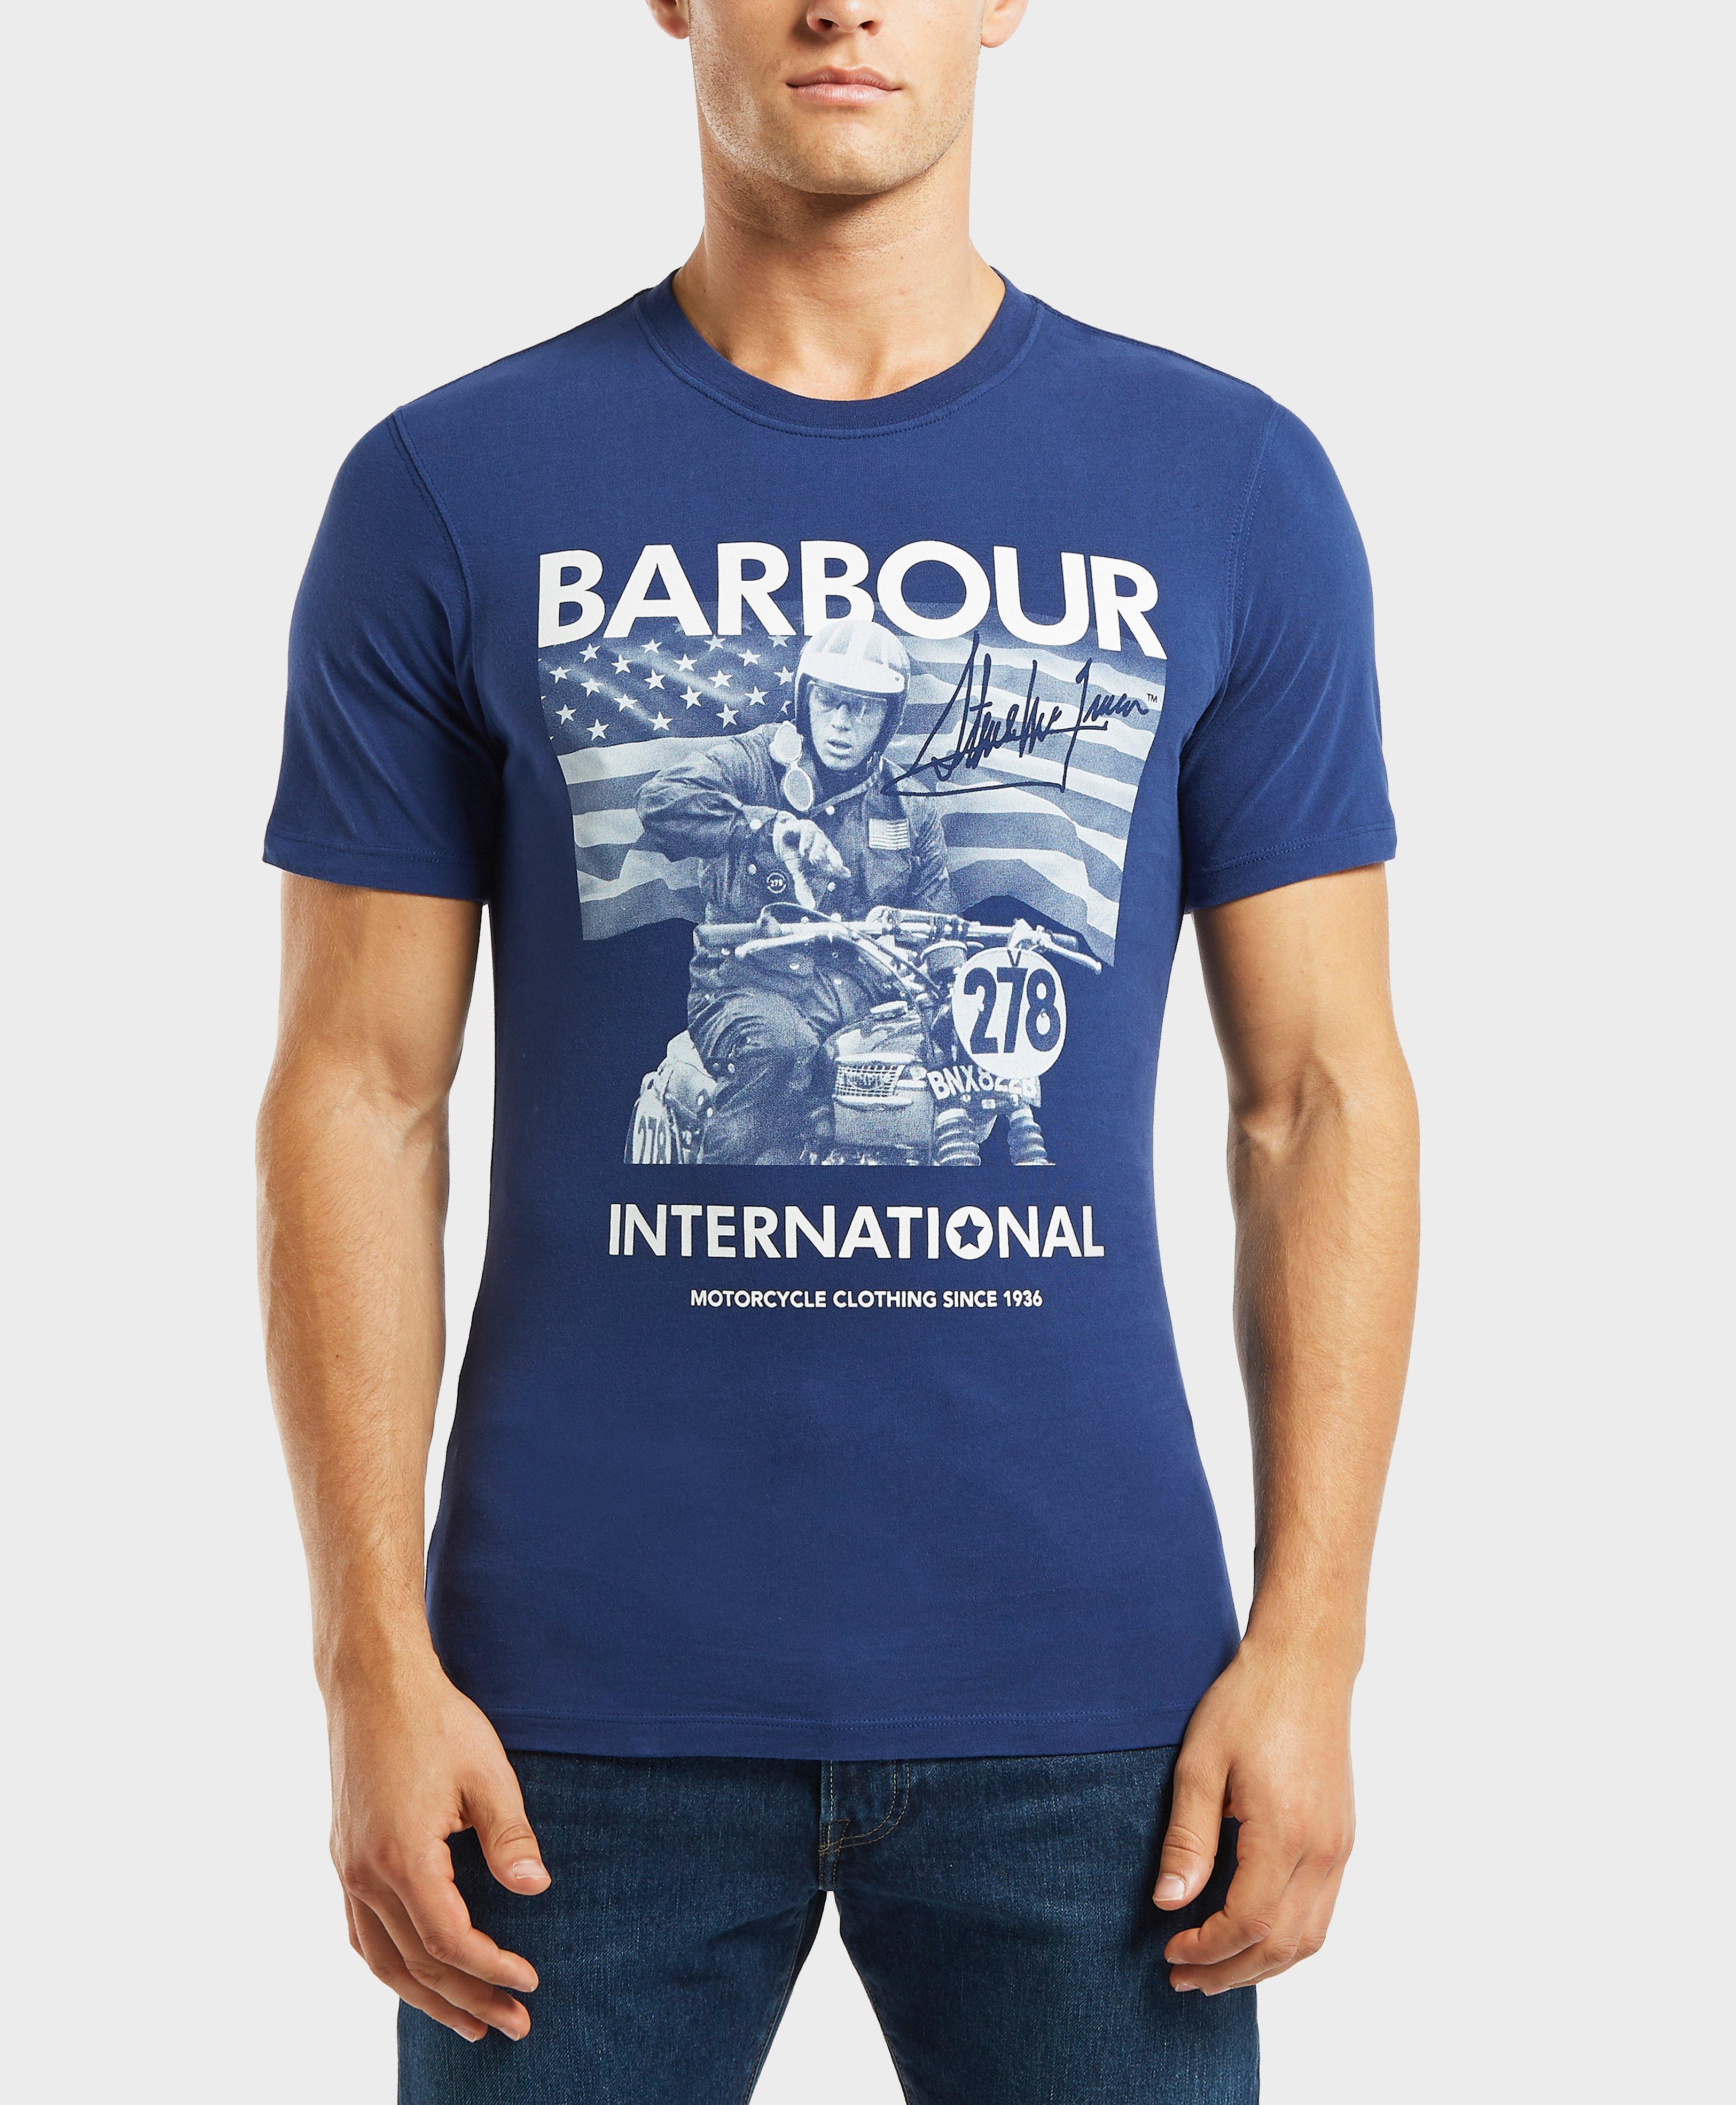 bc7b00f35 Barbour - Mens International X Steve Mcqueen Short Sleeve T-shirt Blue for  Men -. View fullscreen